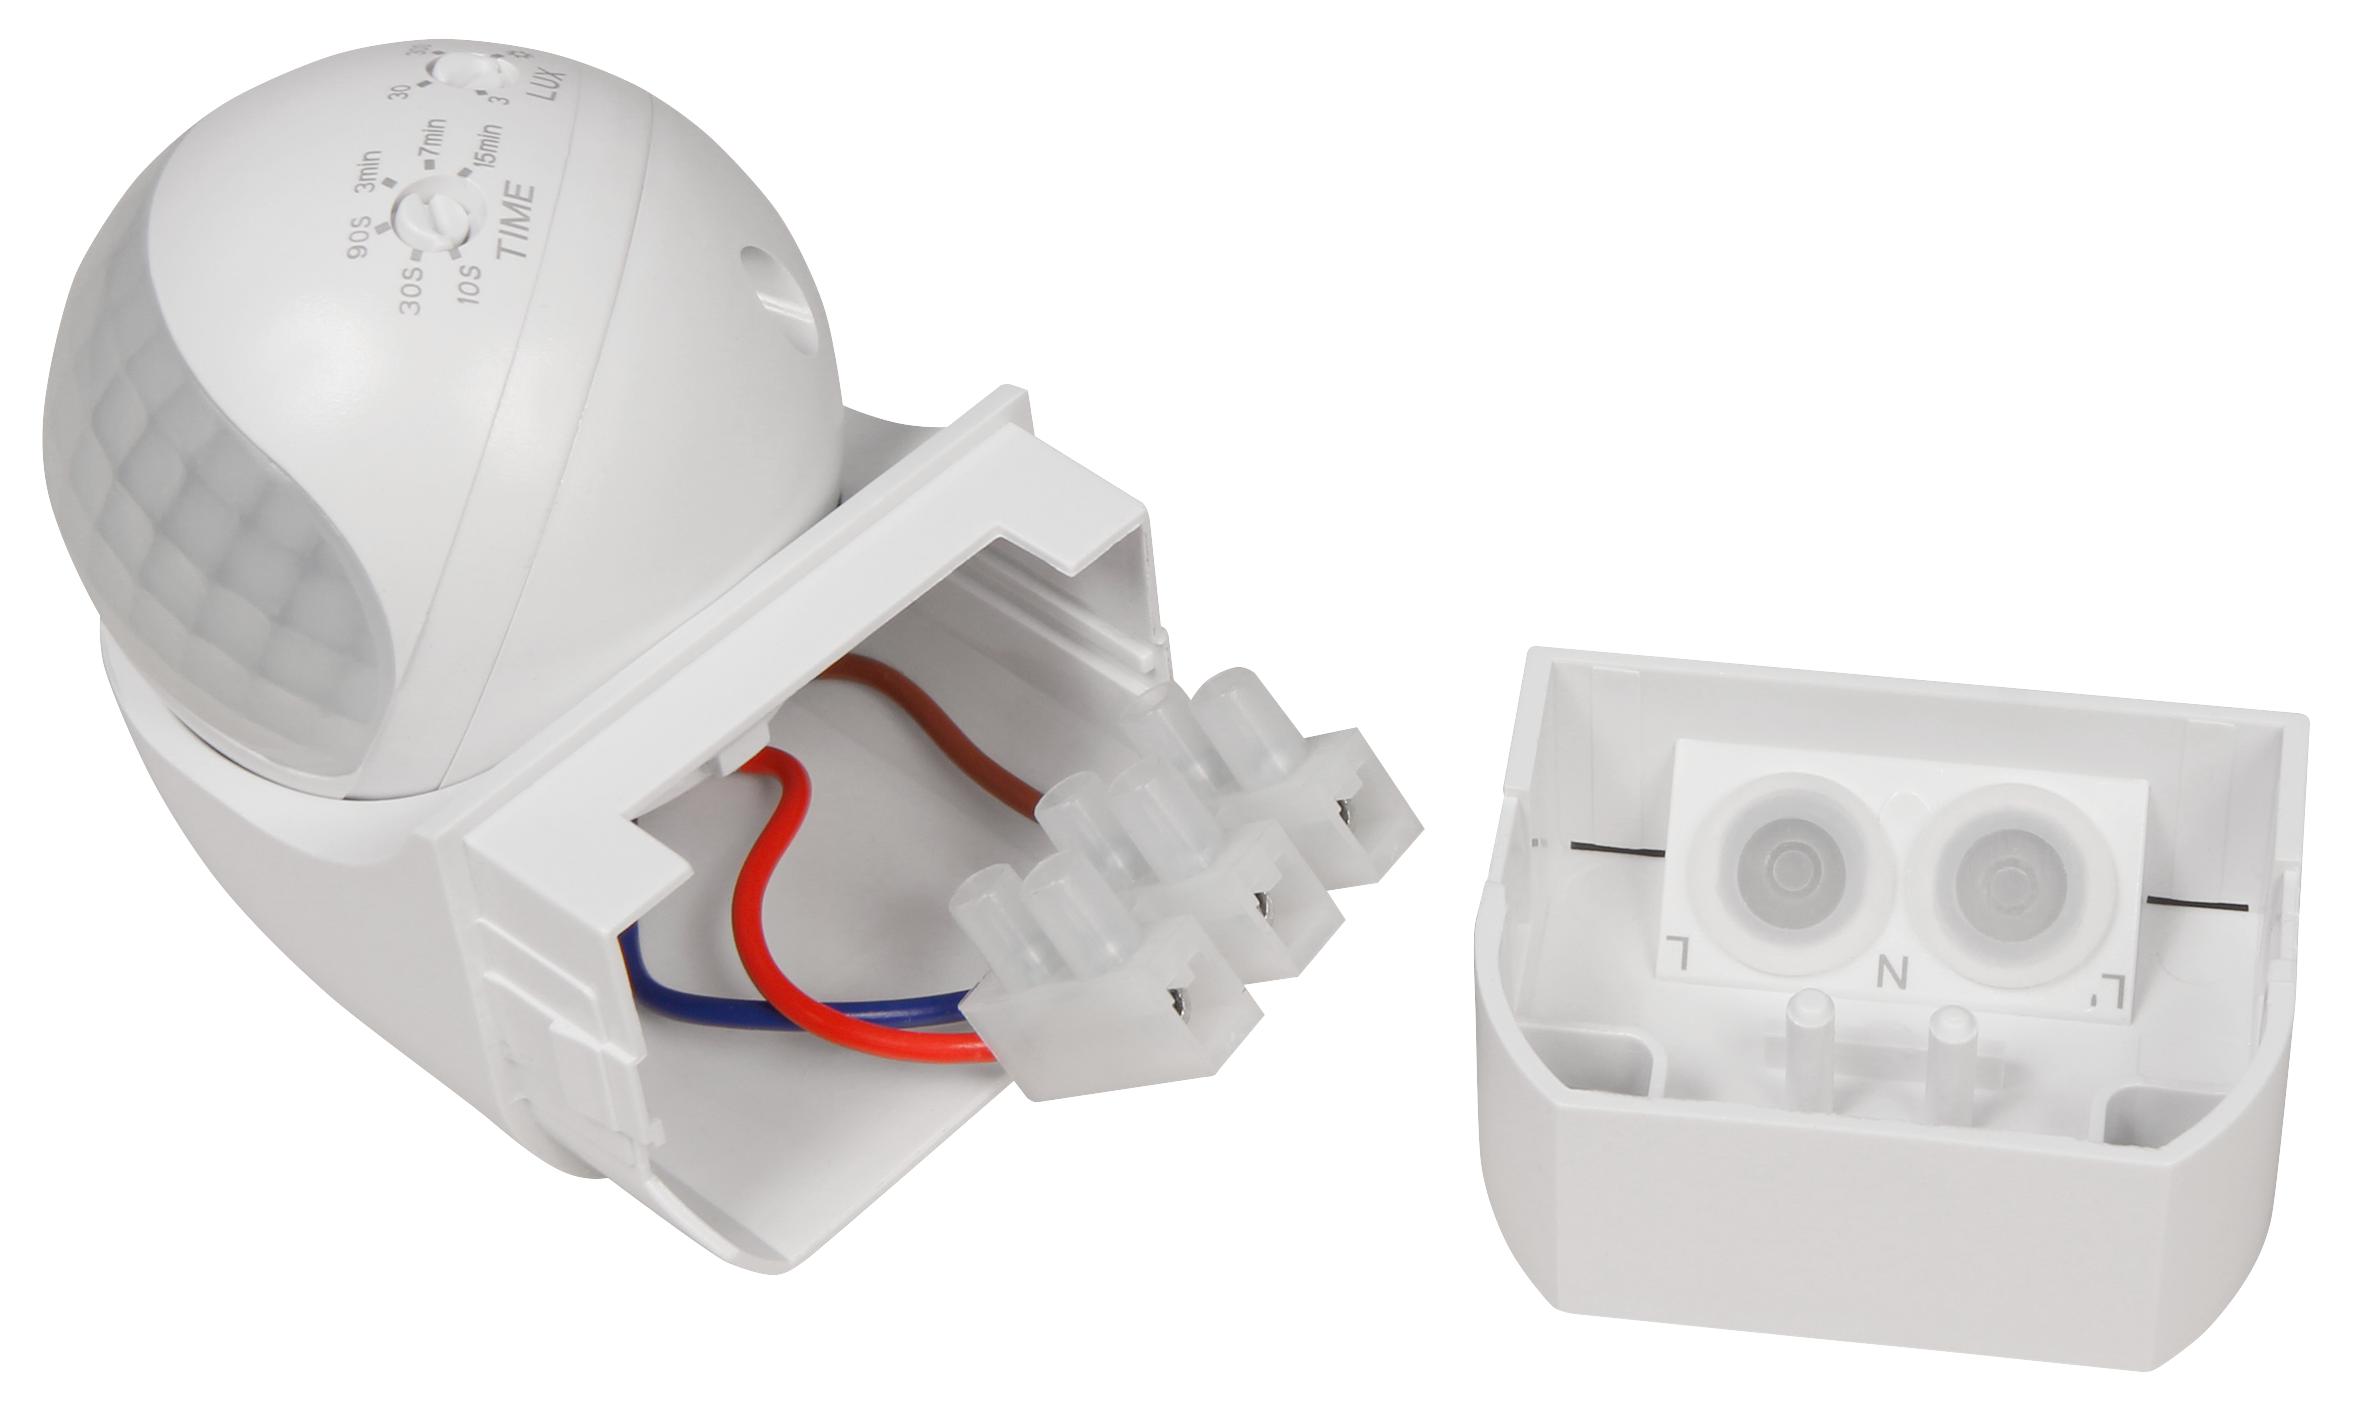 IR Bewegungsmelder McShine ''LX-200'' 180°, 1-800W, LED geeignet, IP44